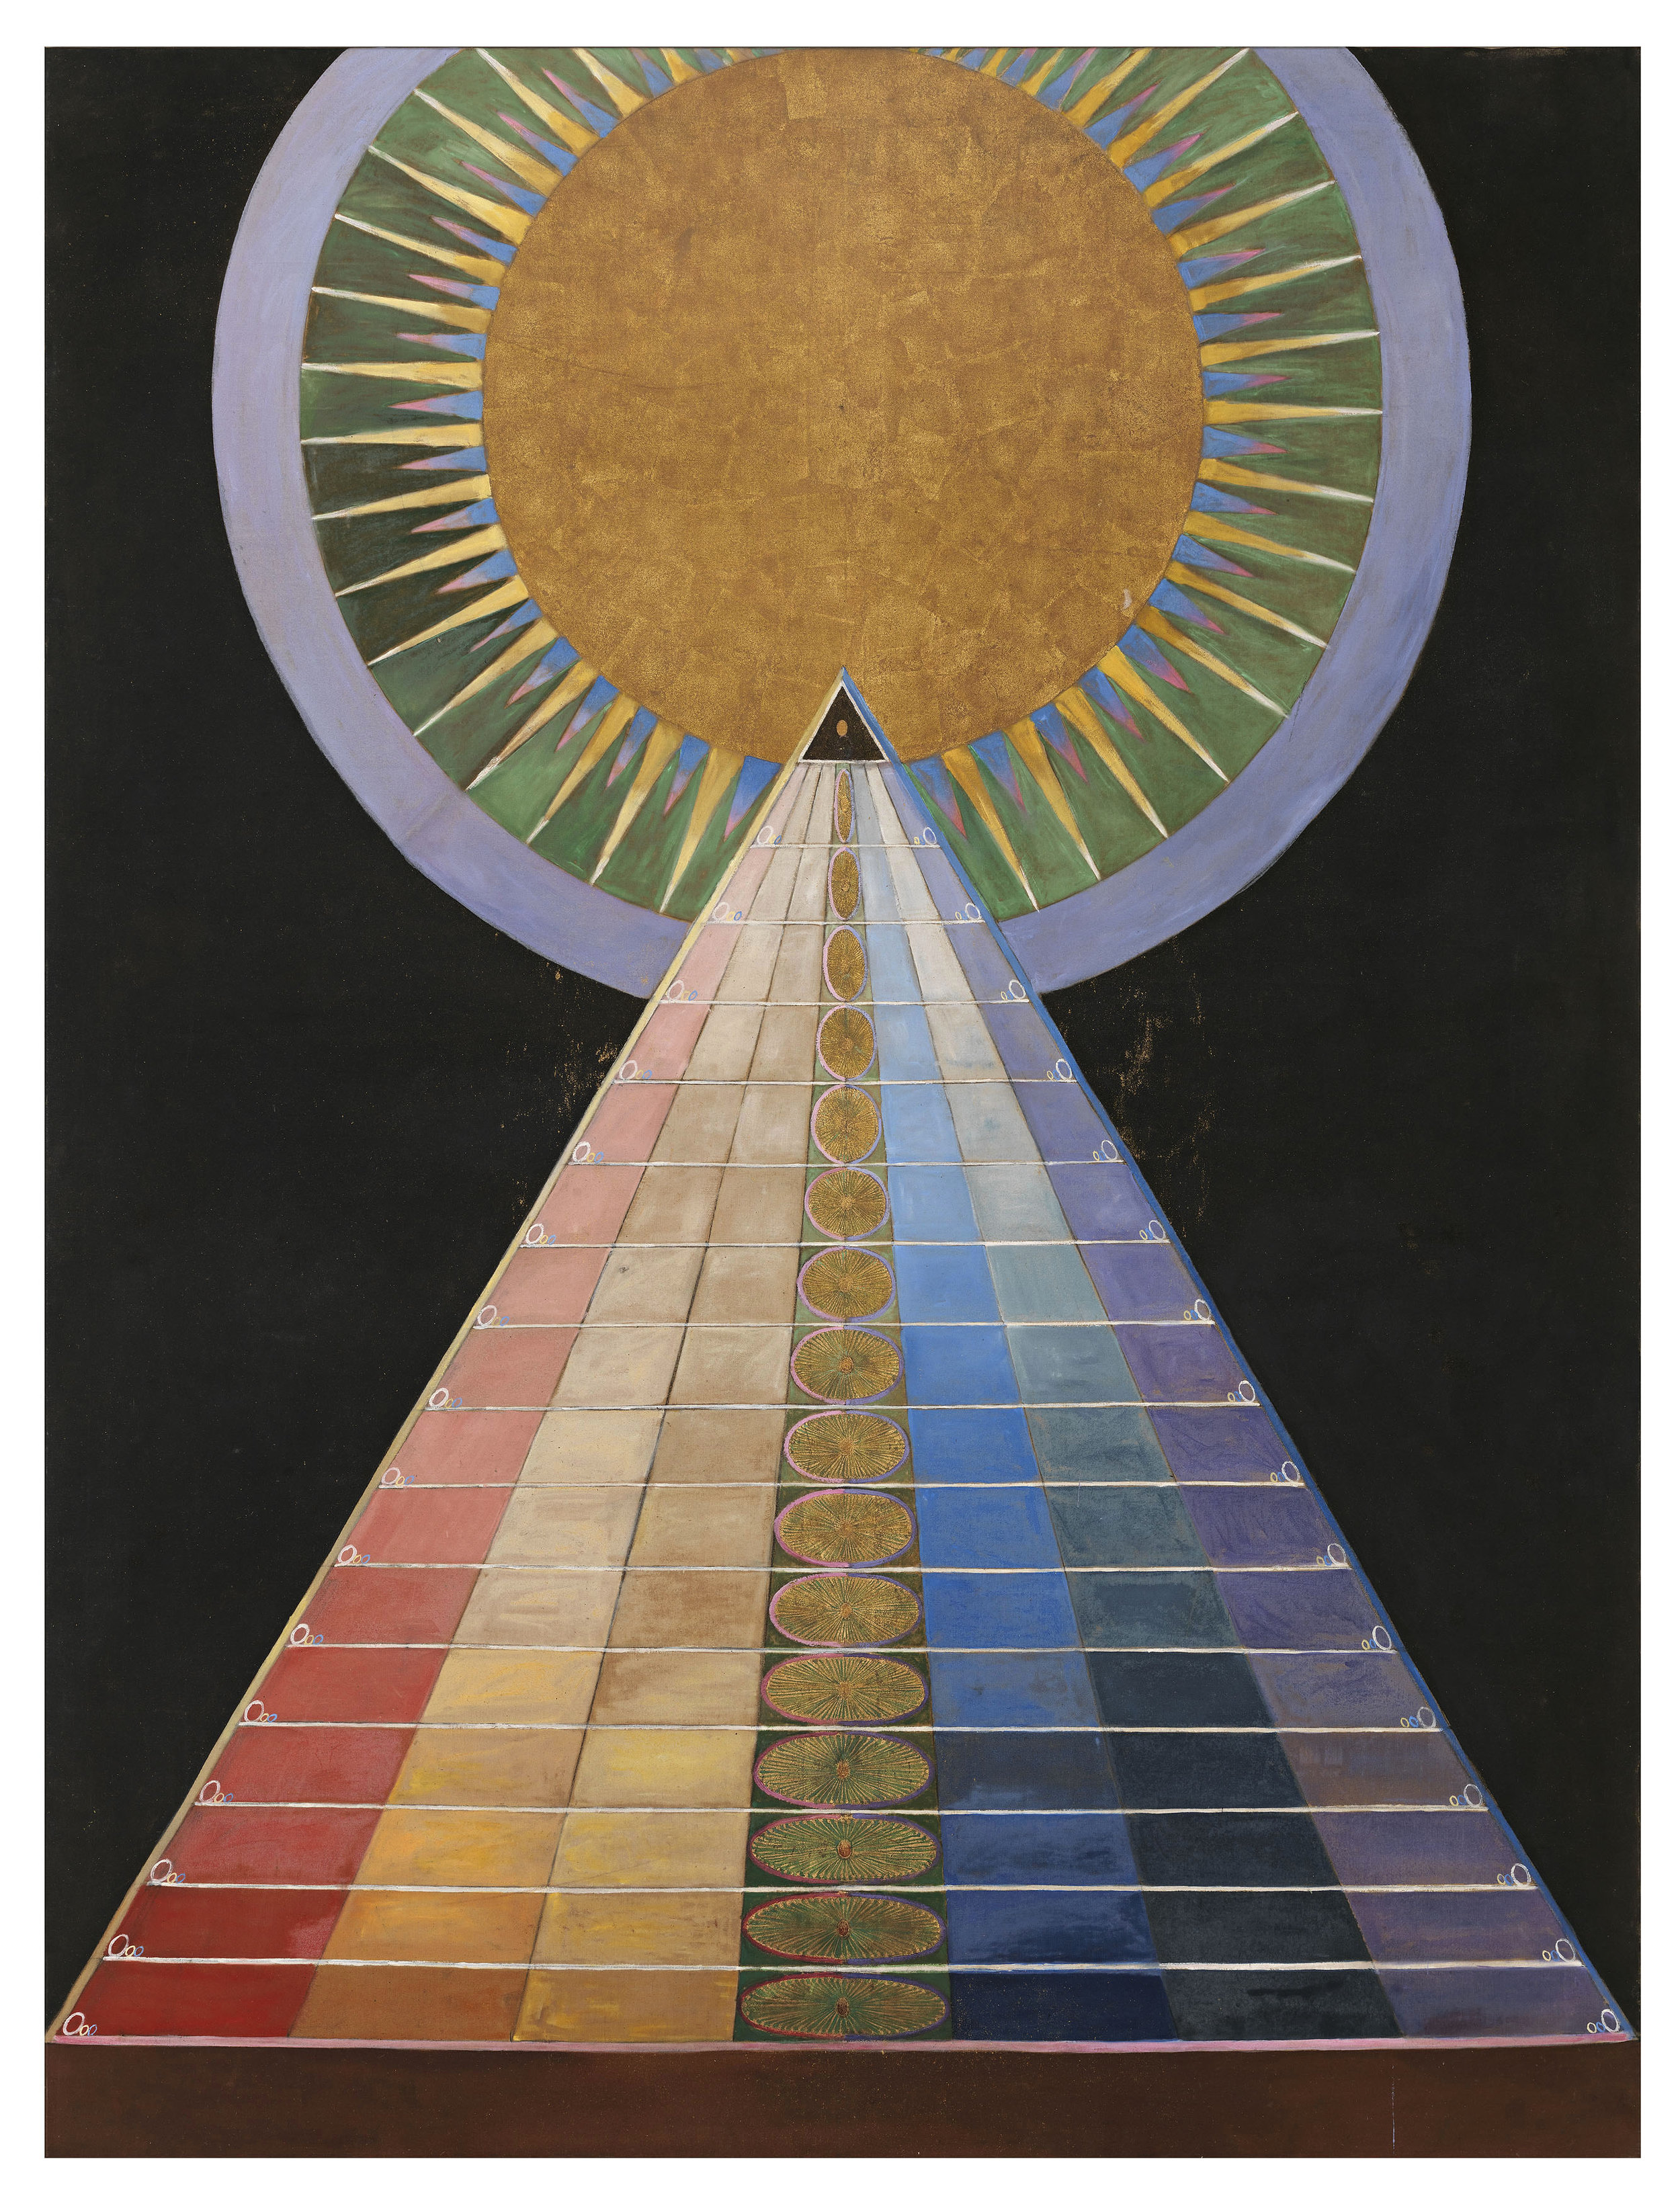 Hilma_af_Klint_-_1907_-_Altarpiece_-_No_1_-_Group_X_-_Altarpieces.jpg